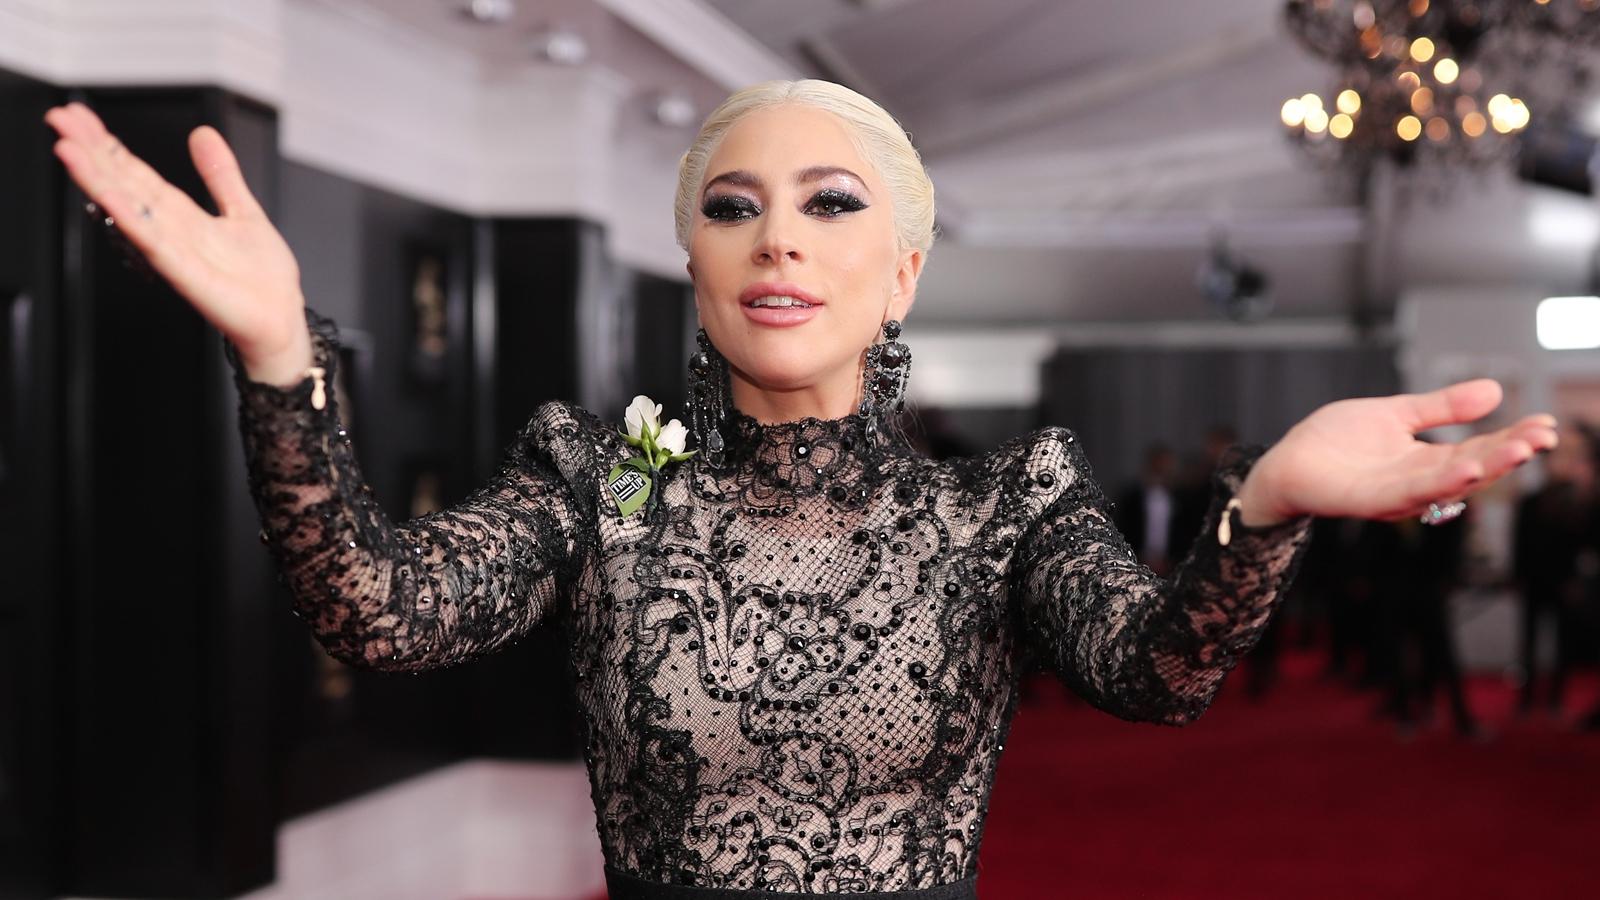 Lady Gaga's dedication to fashion gets dangerous